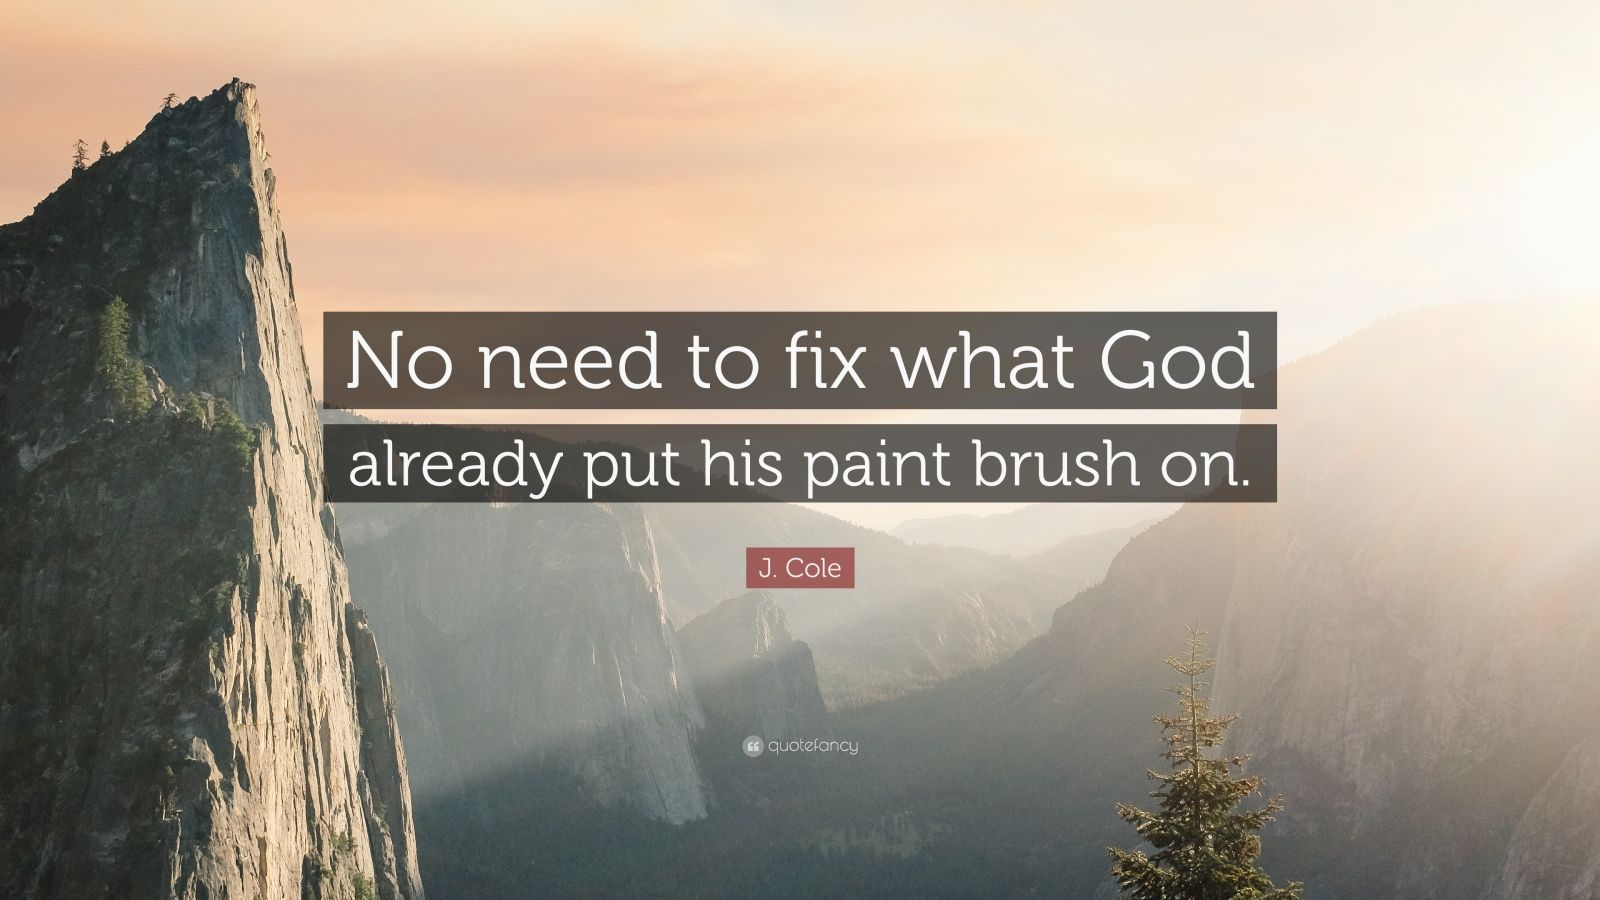 j cole quotes about god - photo #12